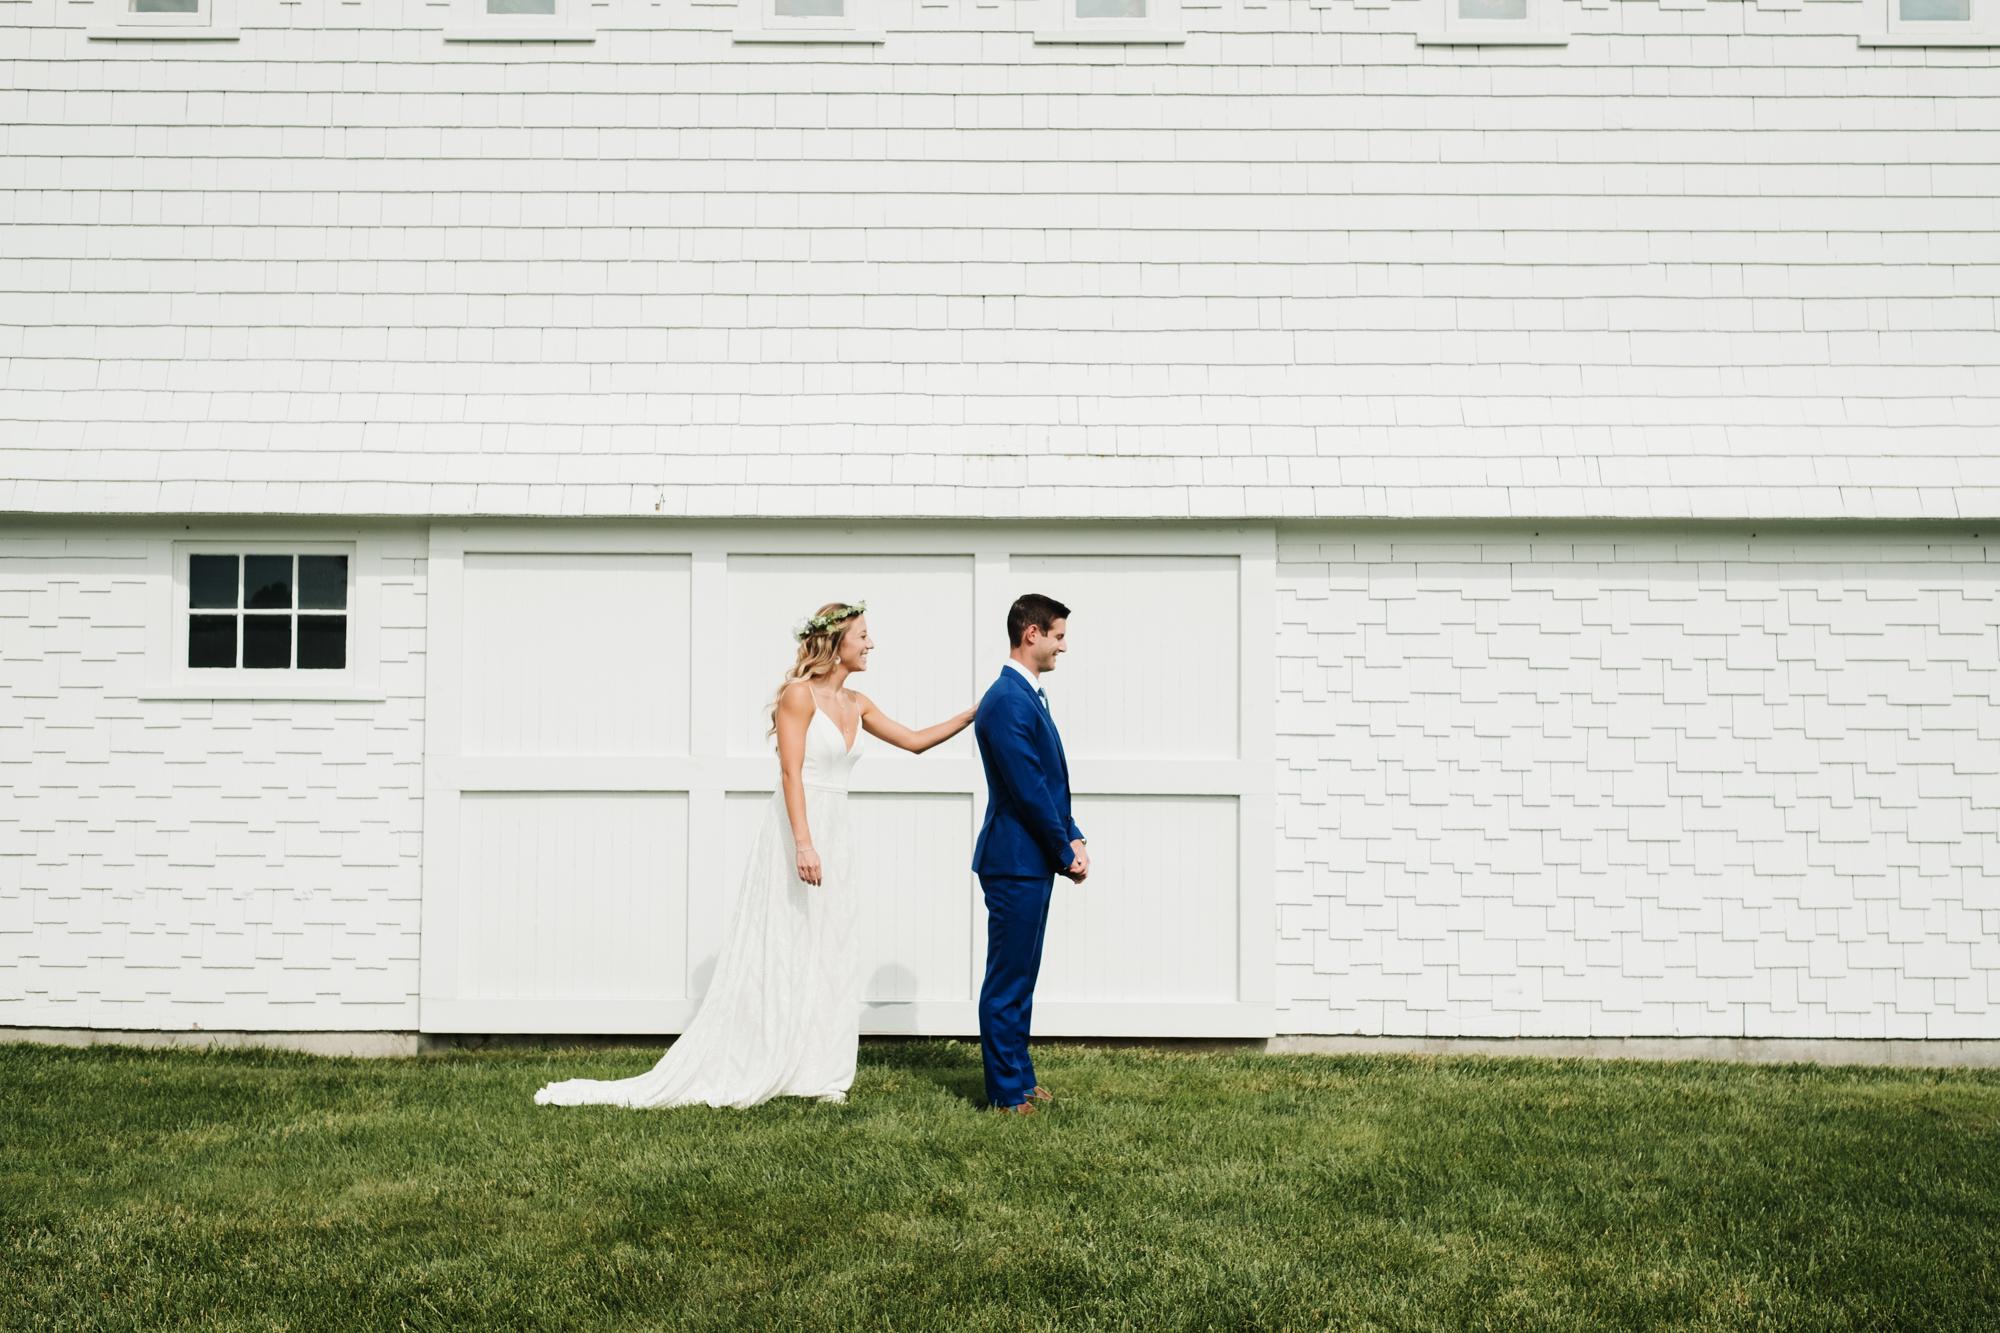 Wedding_Francis_Boucher_Jonathan_Edwards_Winery_2018-23.jpg